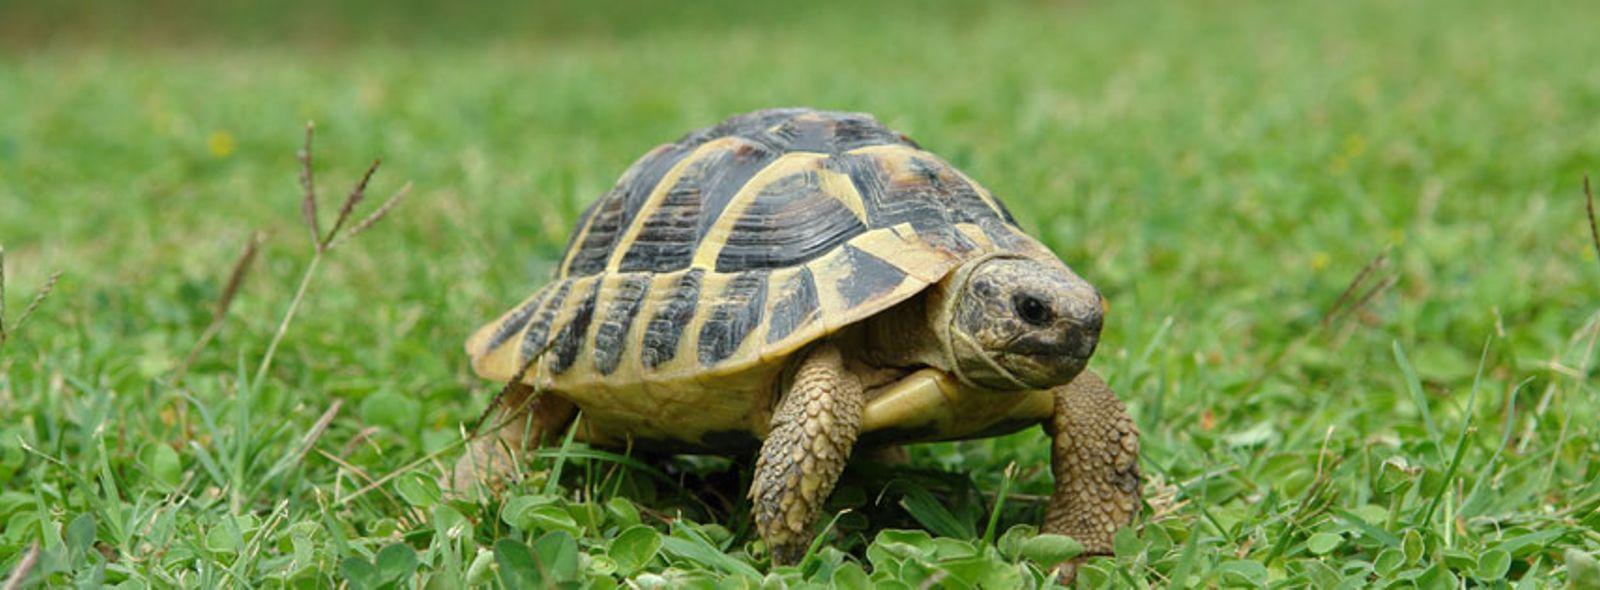 Tartarughe di terra come allevarle trovami for Termoriscaldatore per tartarughe